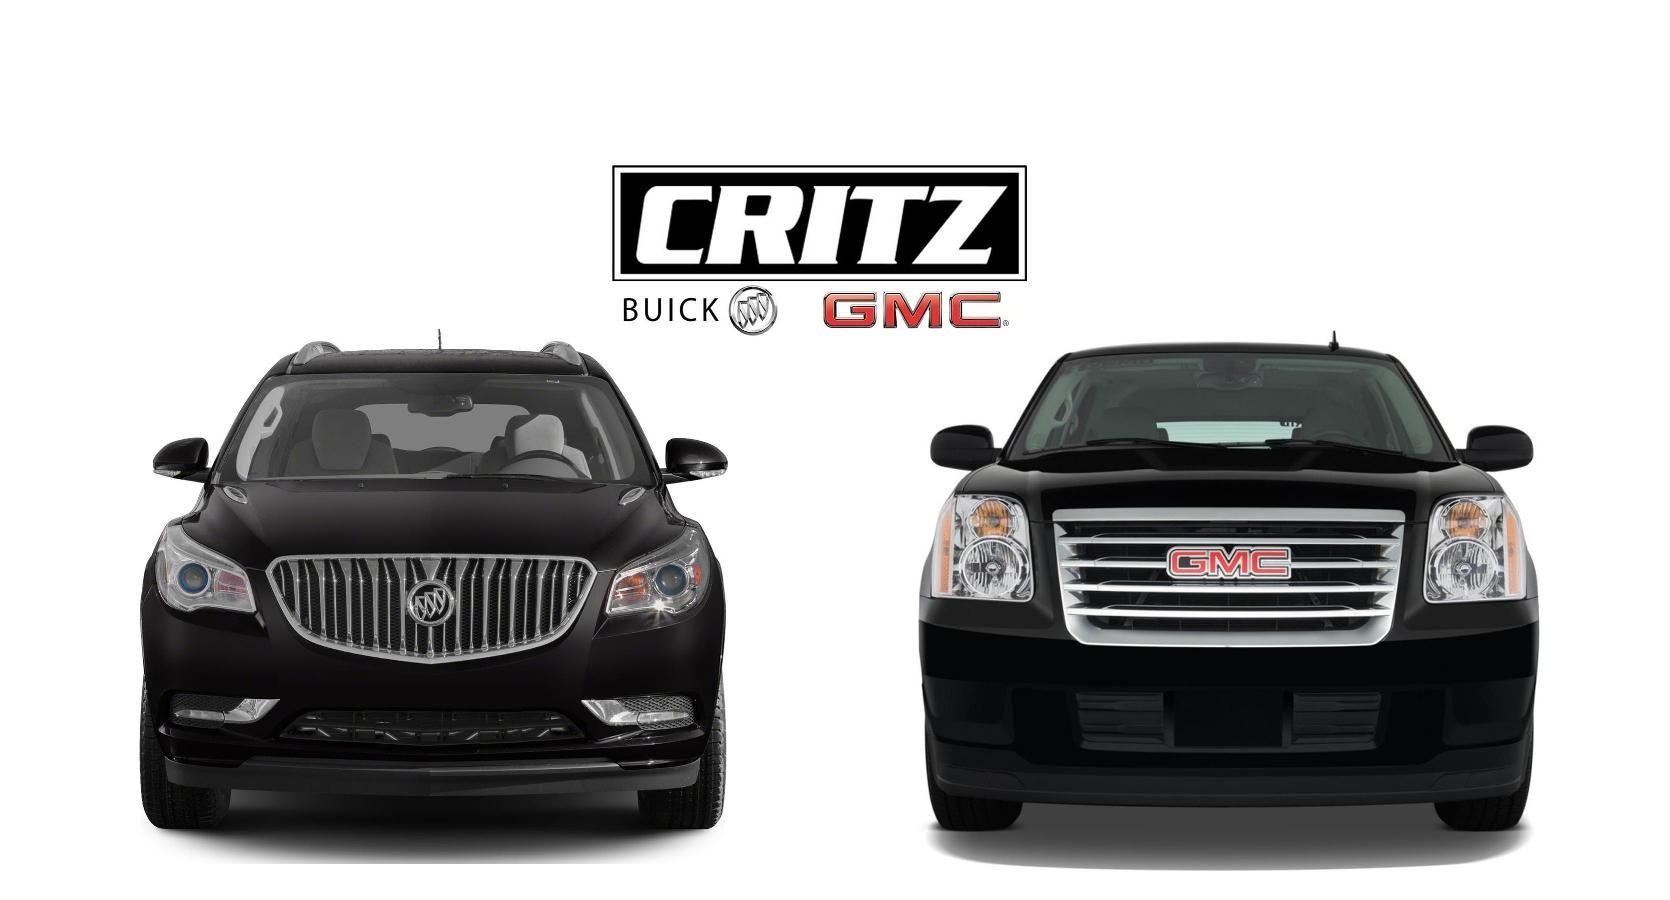 Critz Auto Group In Savannah GA Mercedes Benz Gmc Vehicles Buick